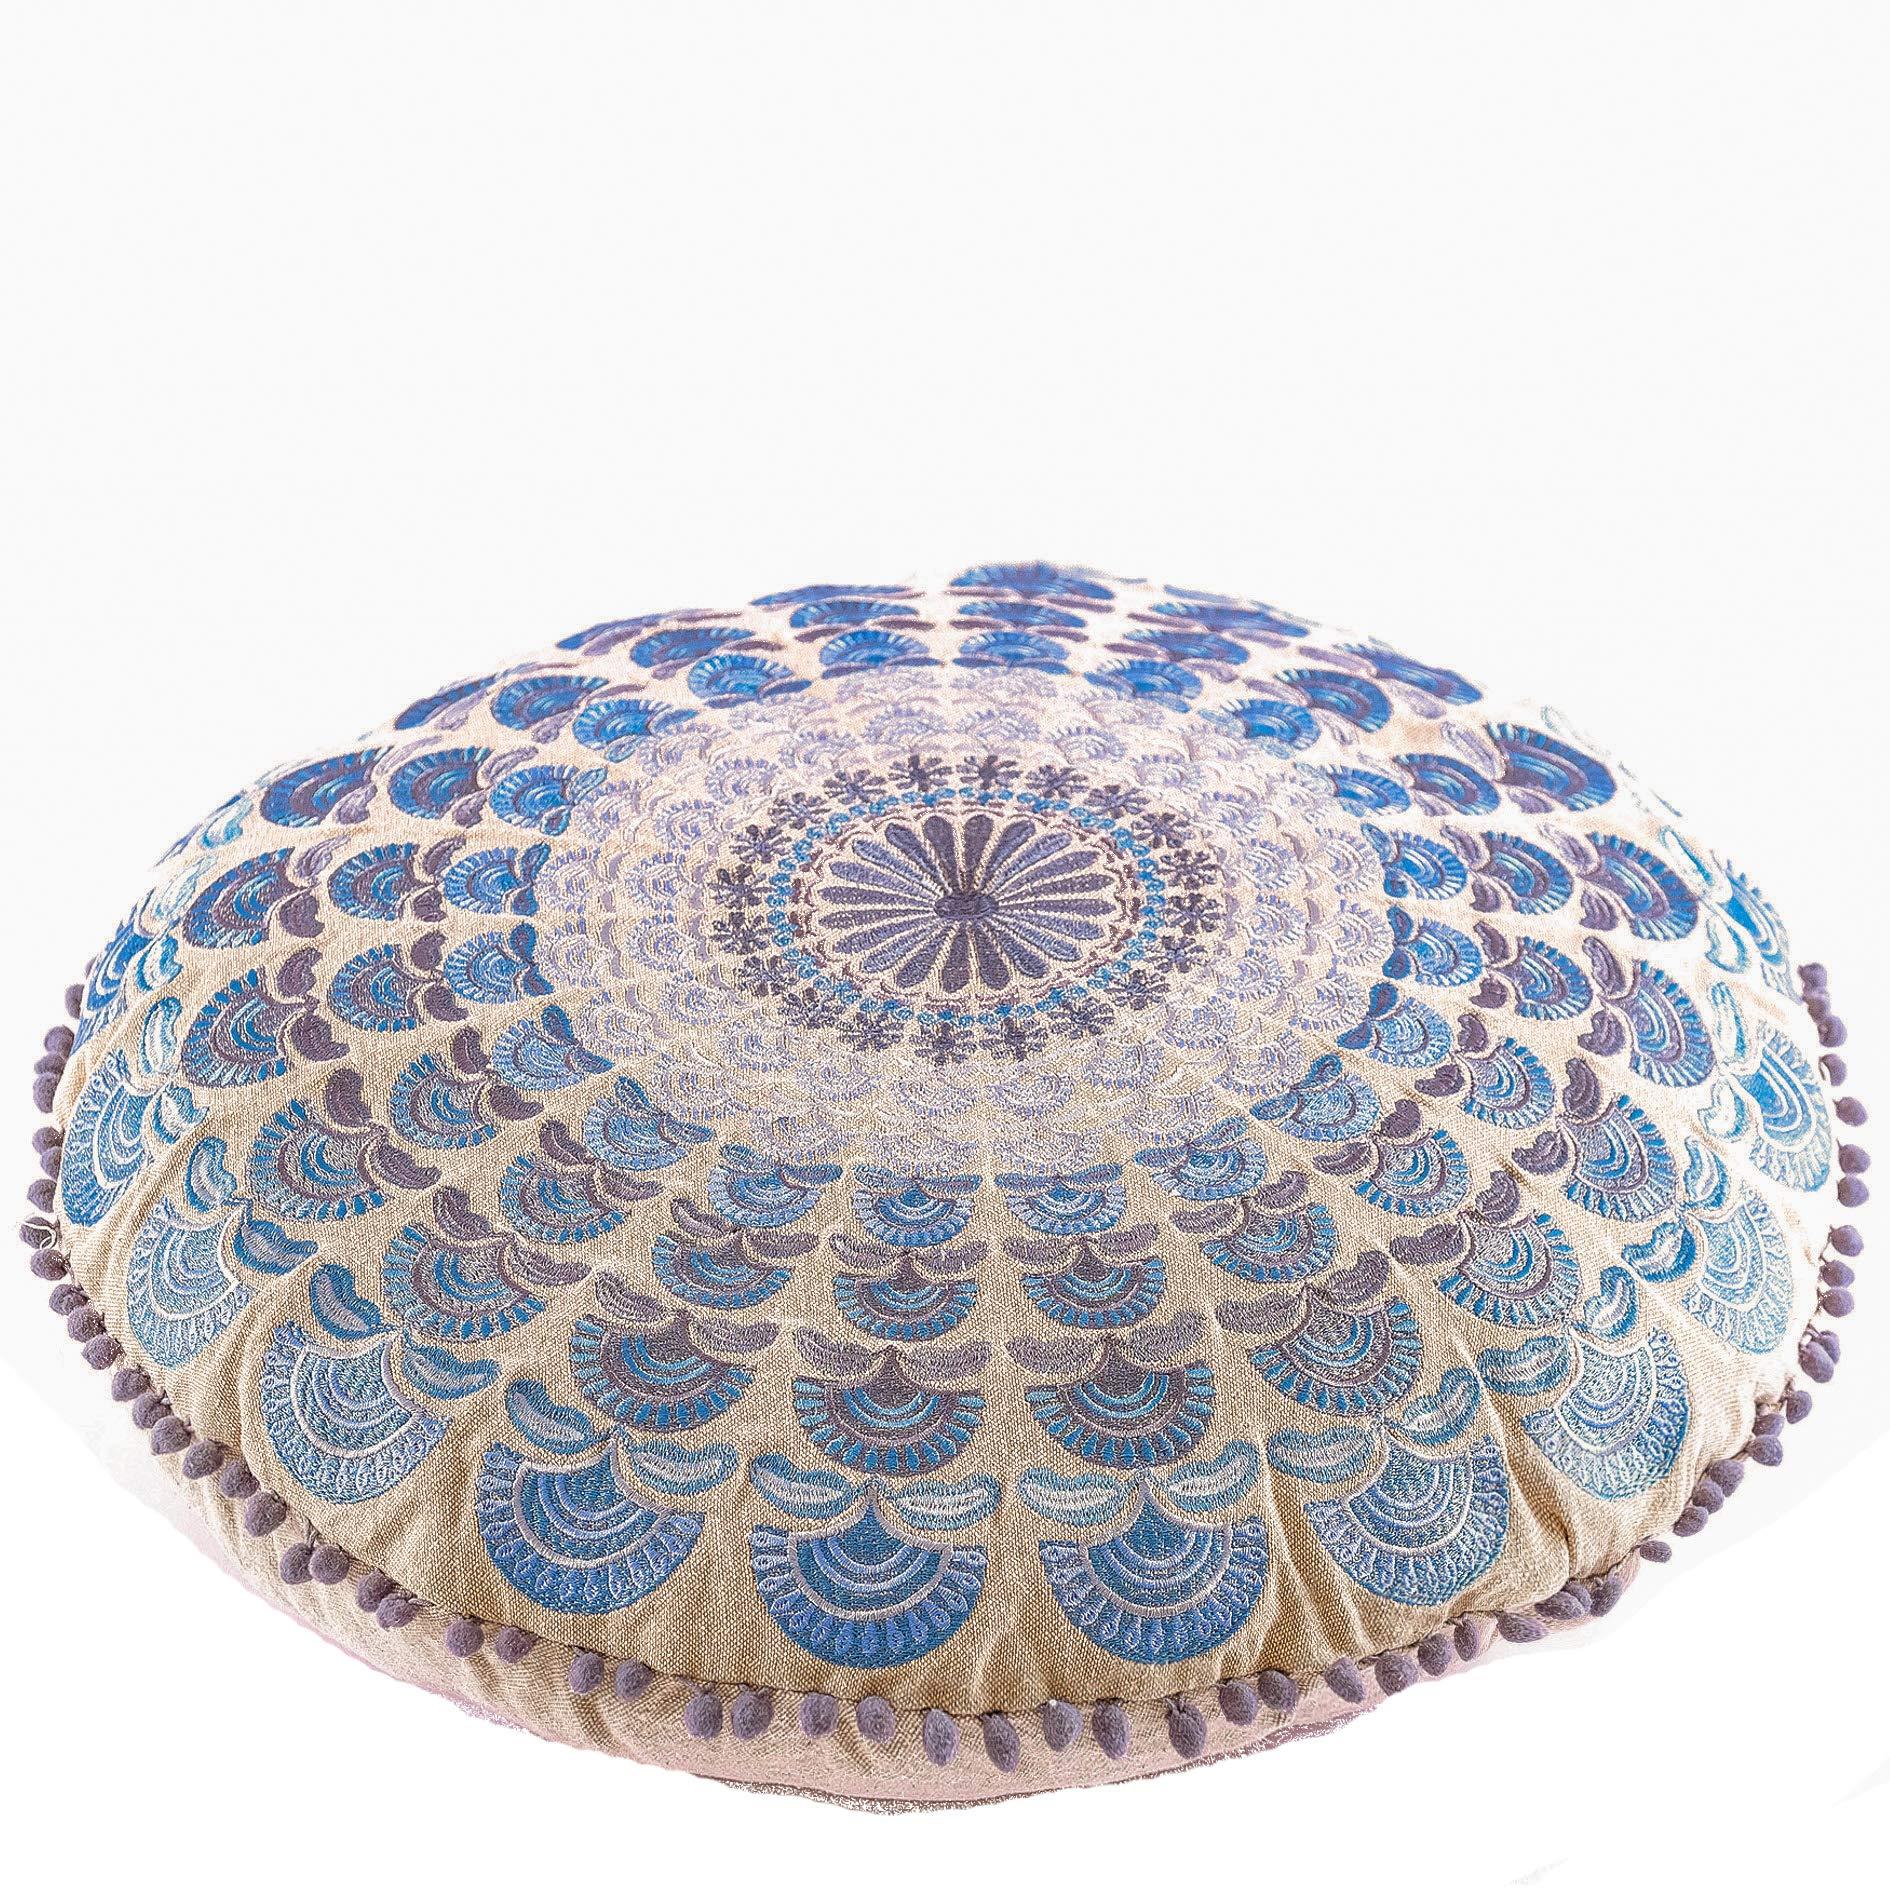 Mandala Life ART Peacock Pouf (Cushion Stuffed 24'', Blue Embroidery) by Mandala Life ART